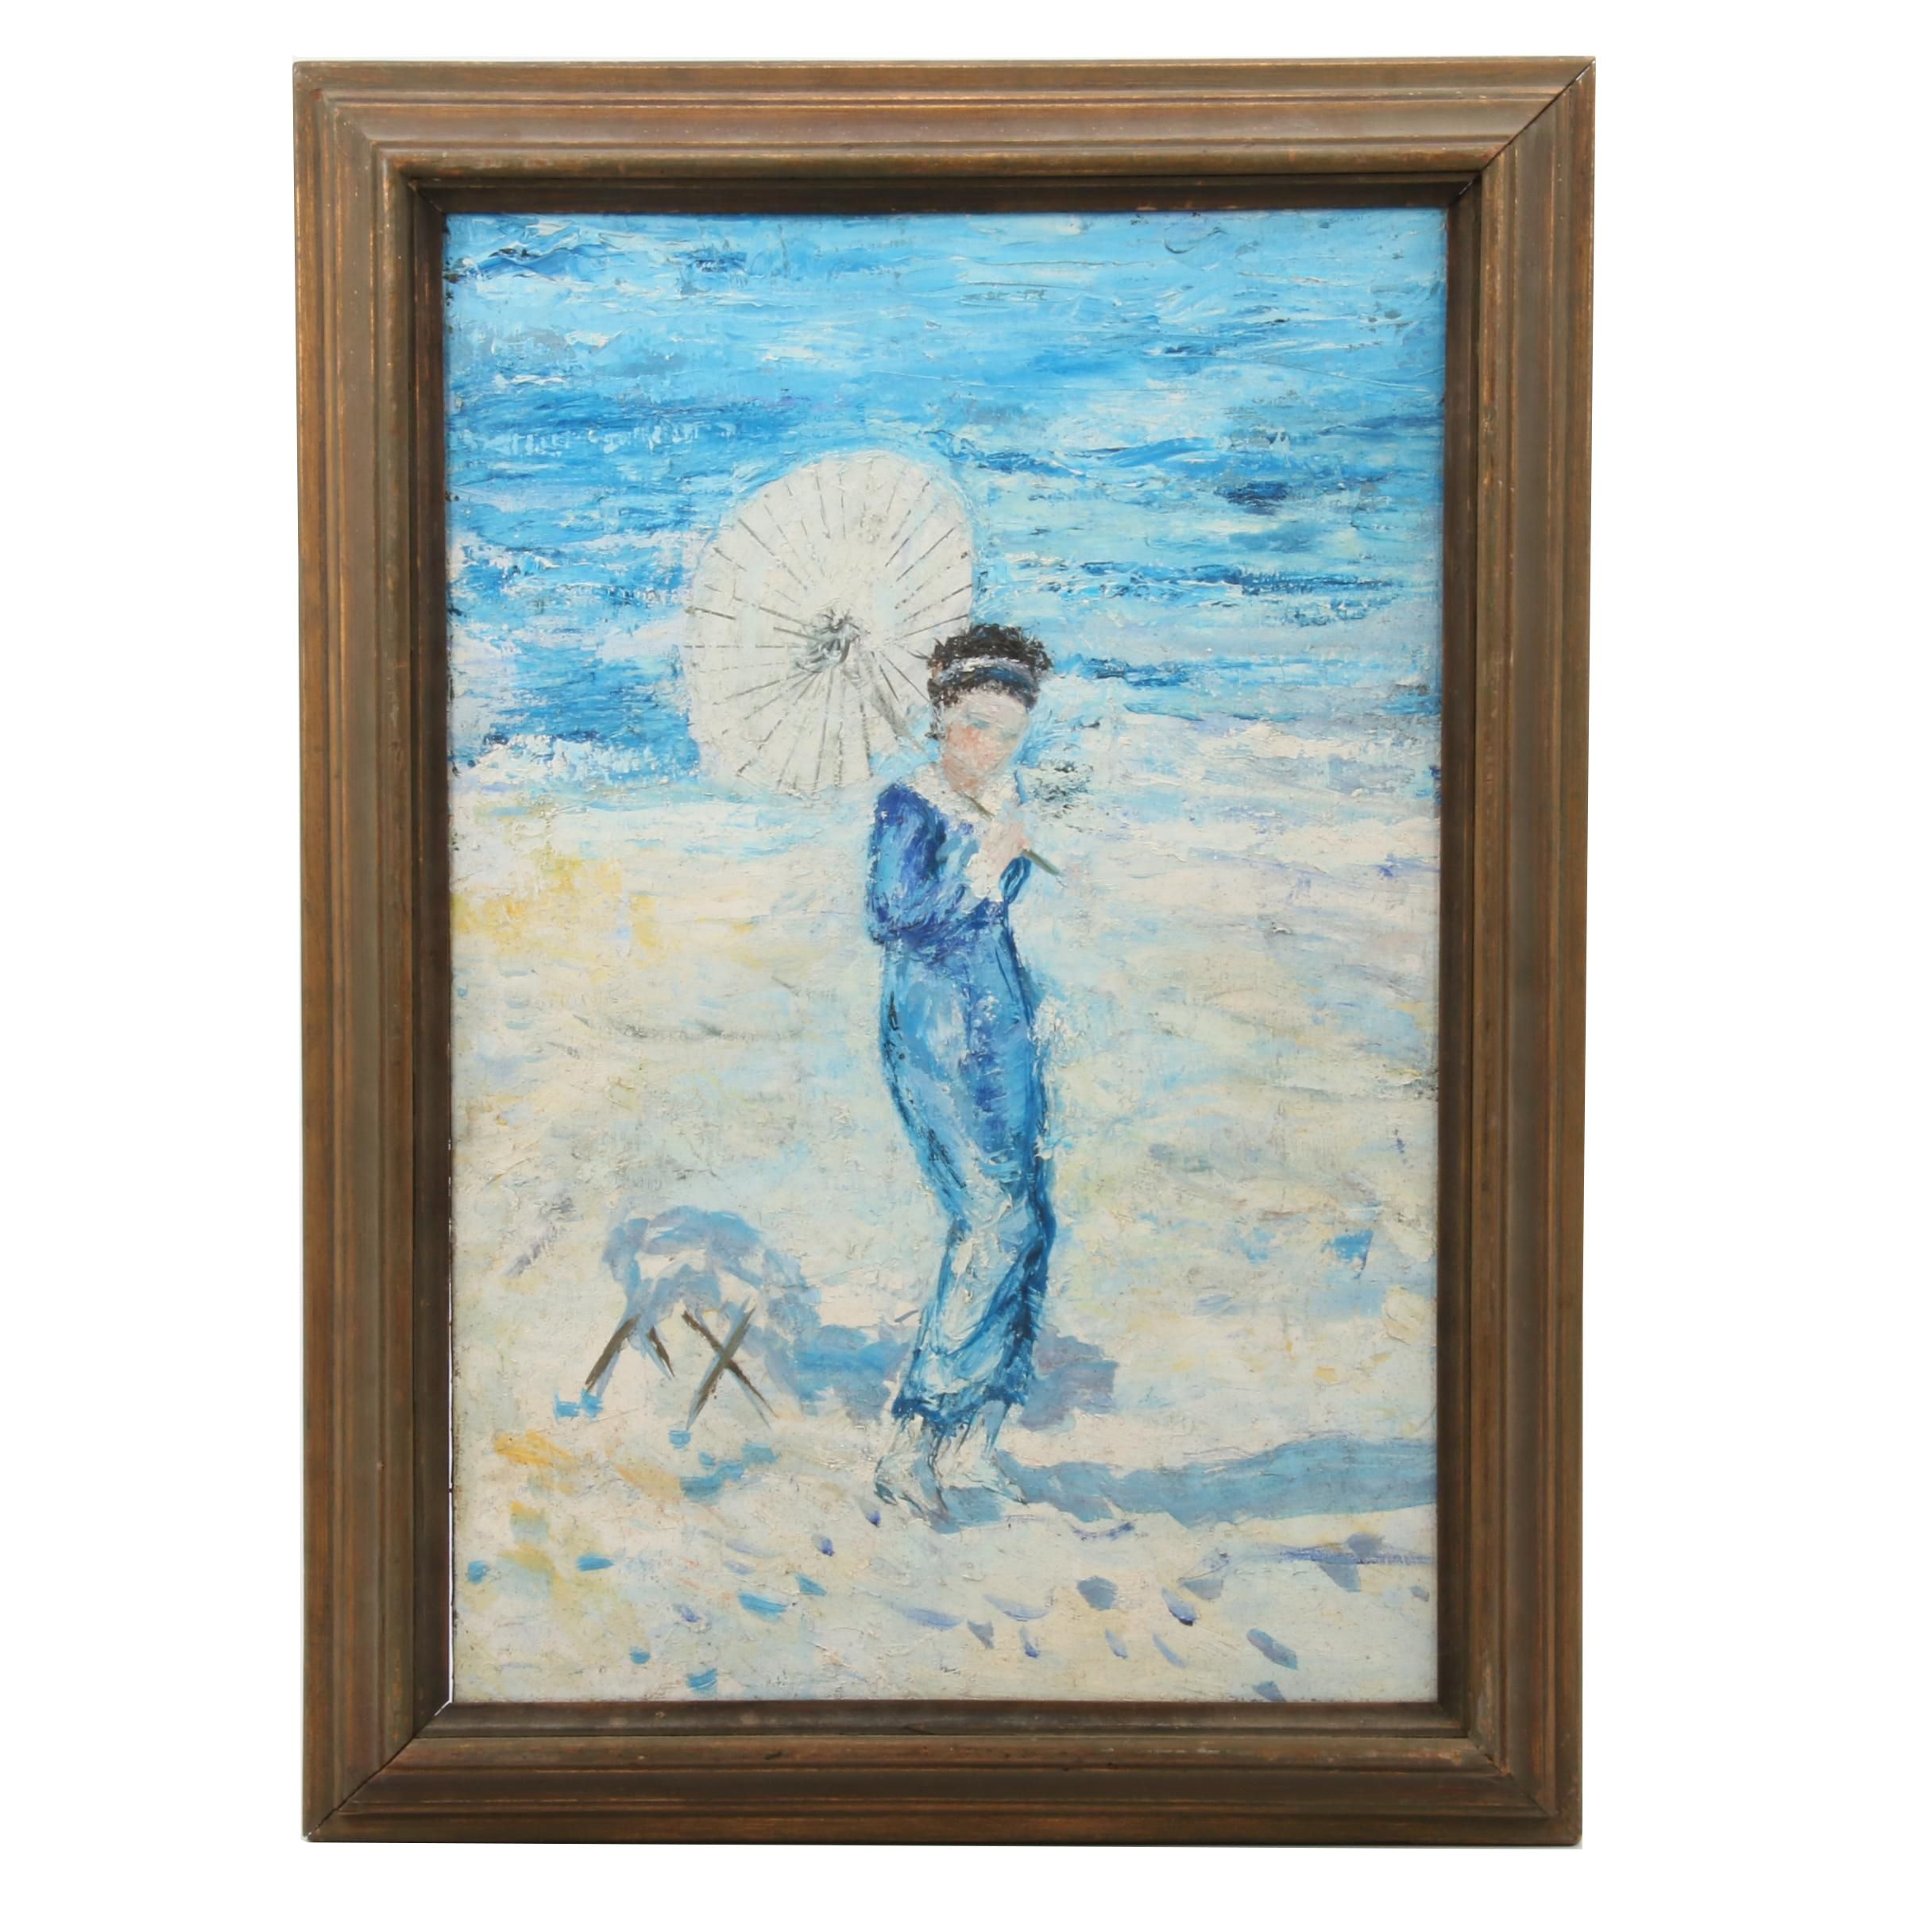 Mid 20th Century Impasto Oil Painting